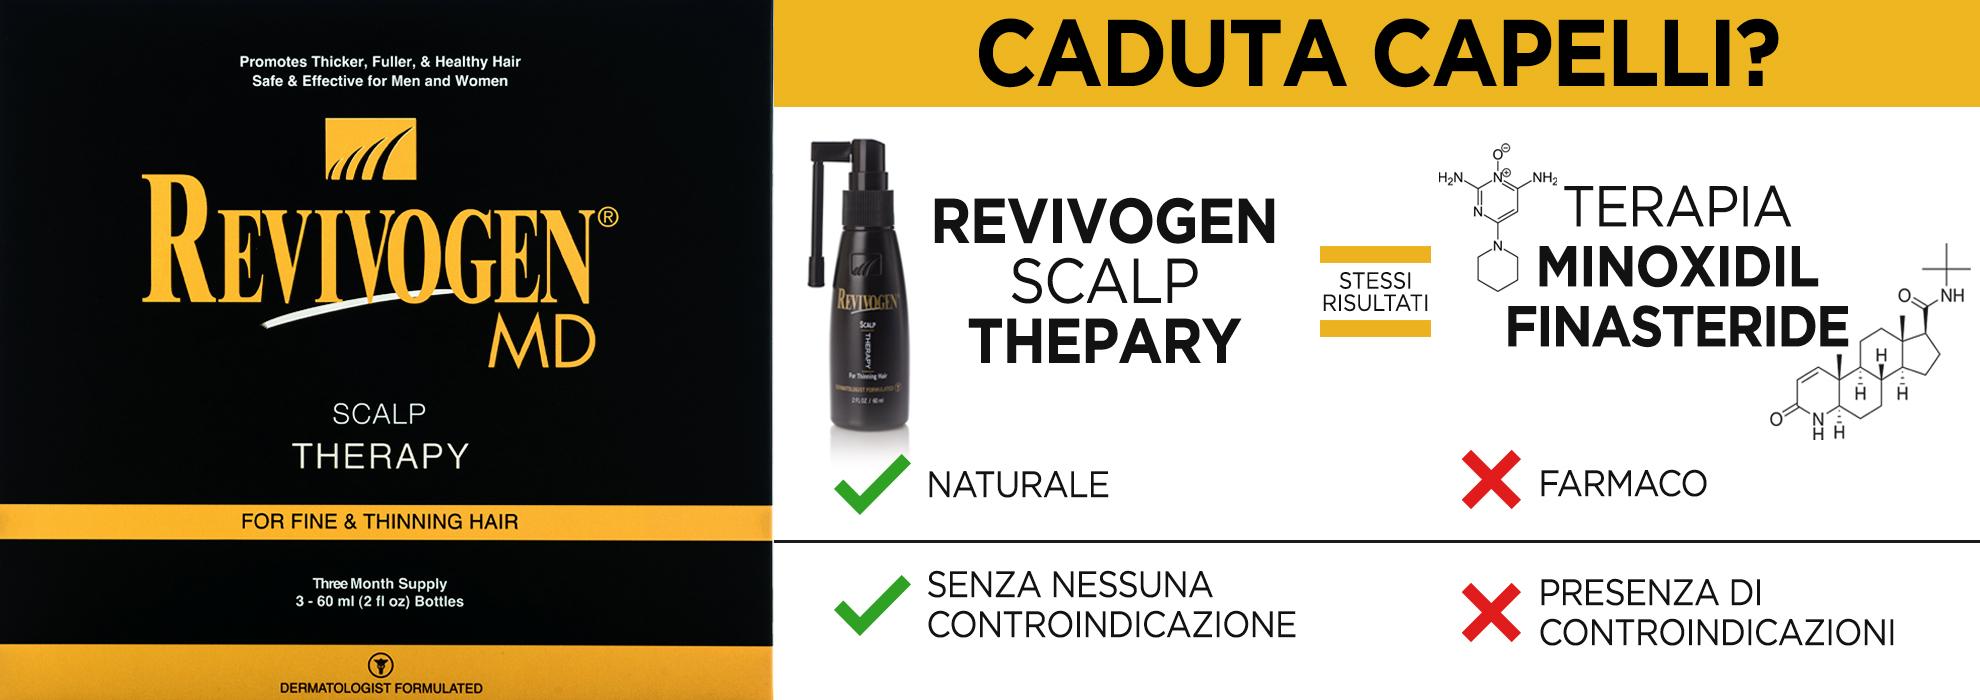 Revivogen Scalp Therapy